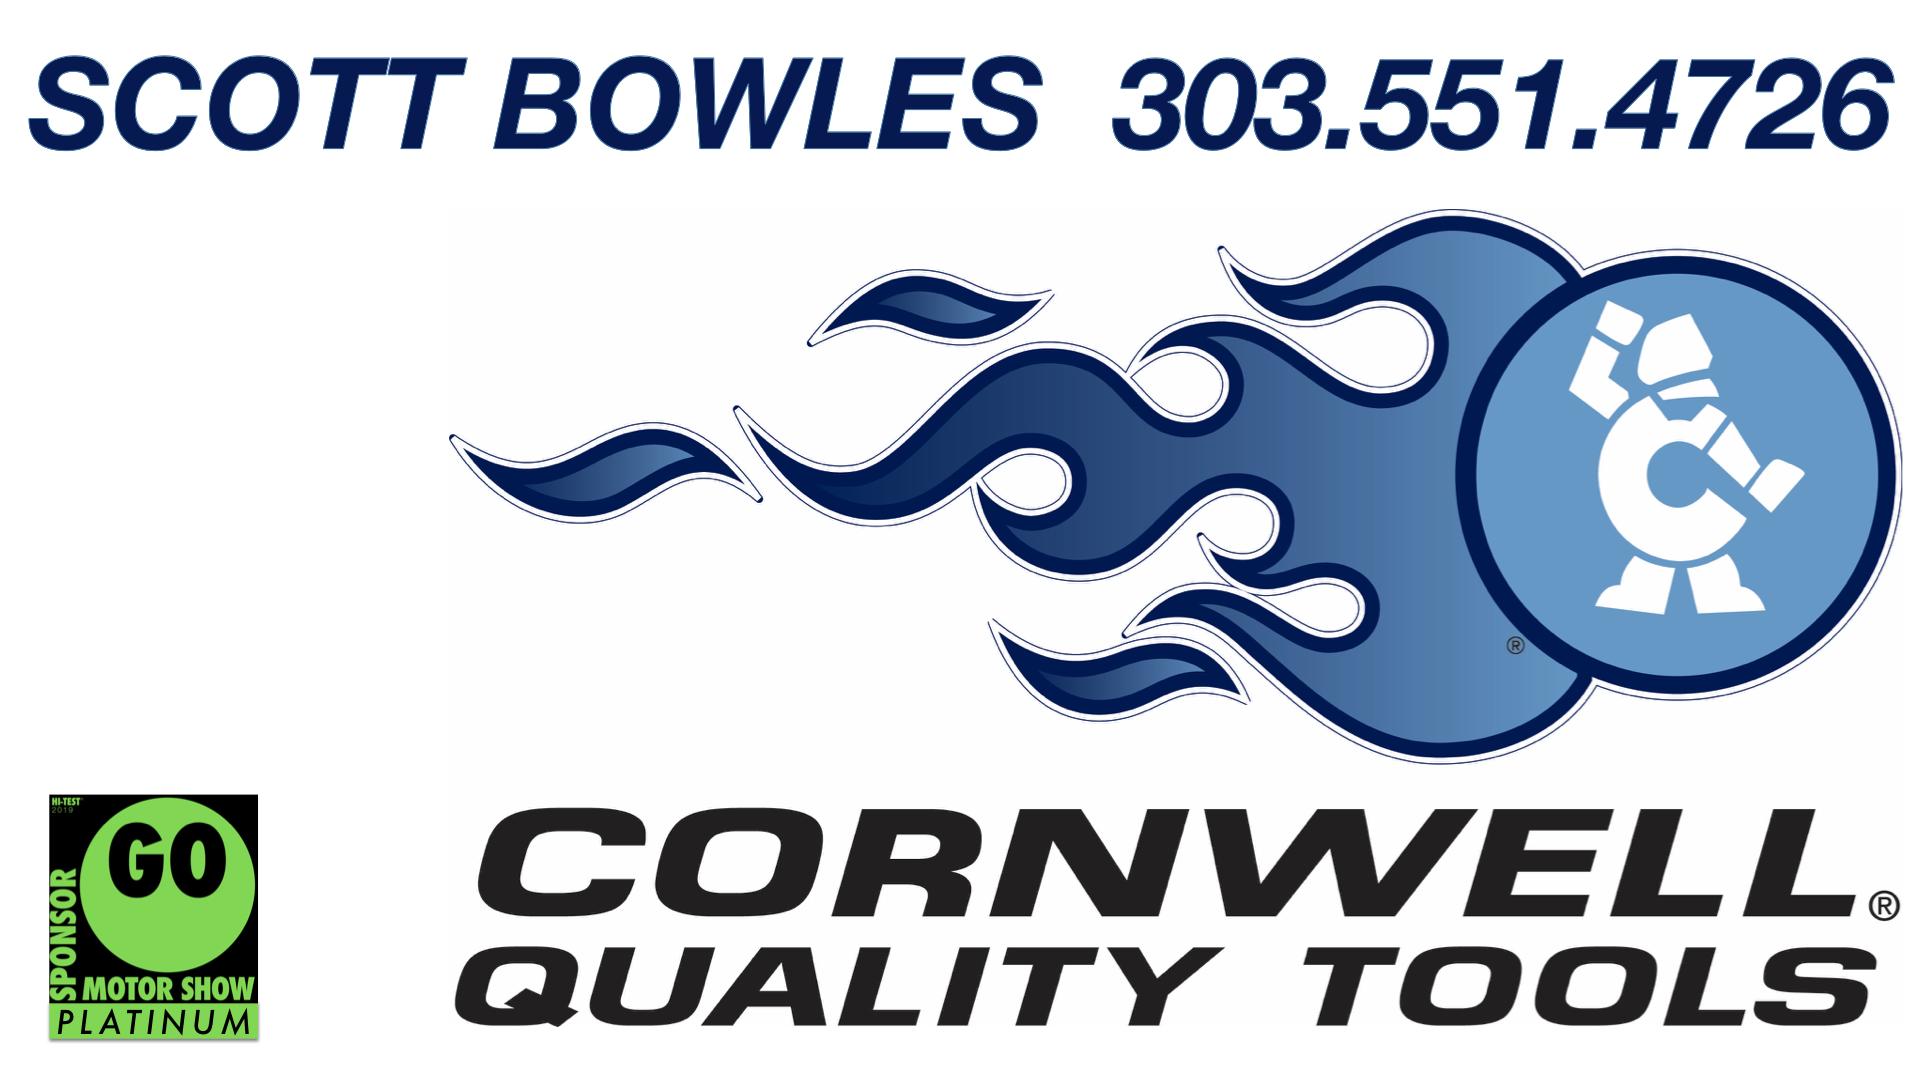 Cornwell Tools Scott Bowles